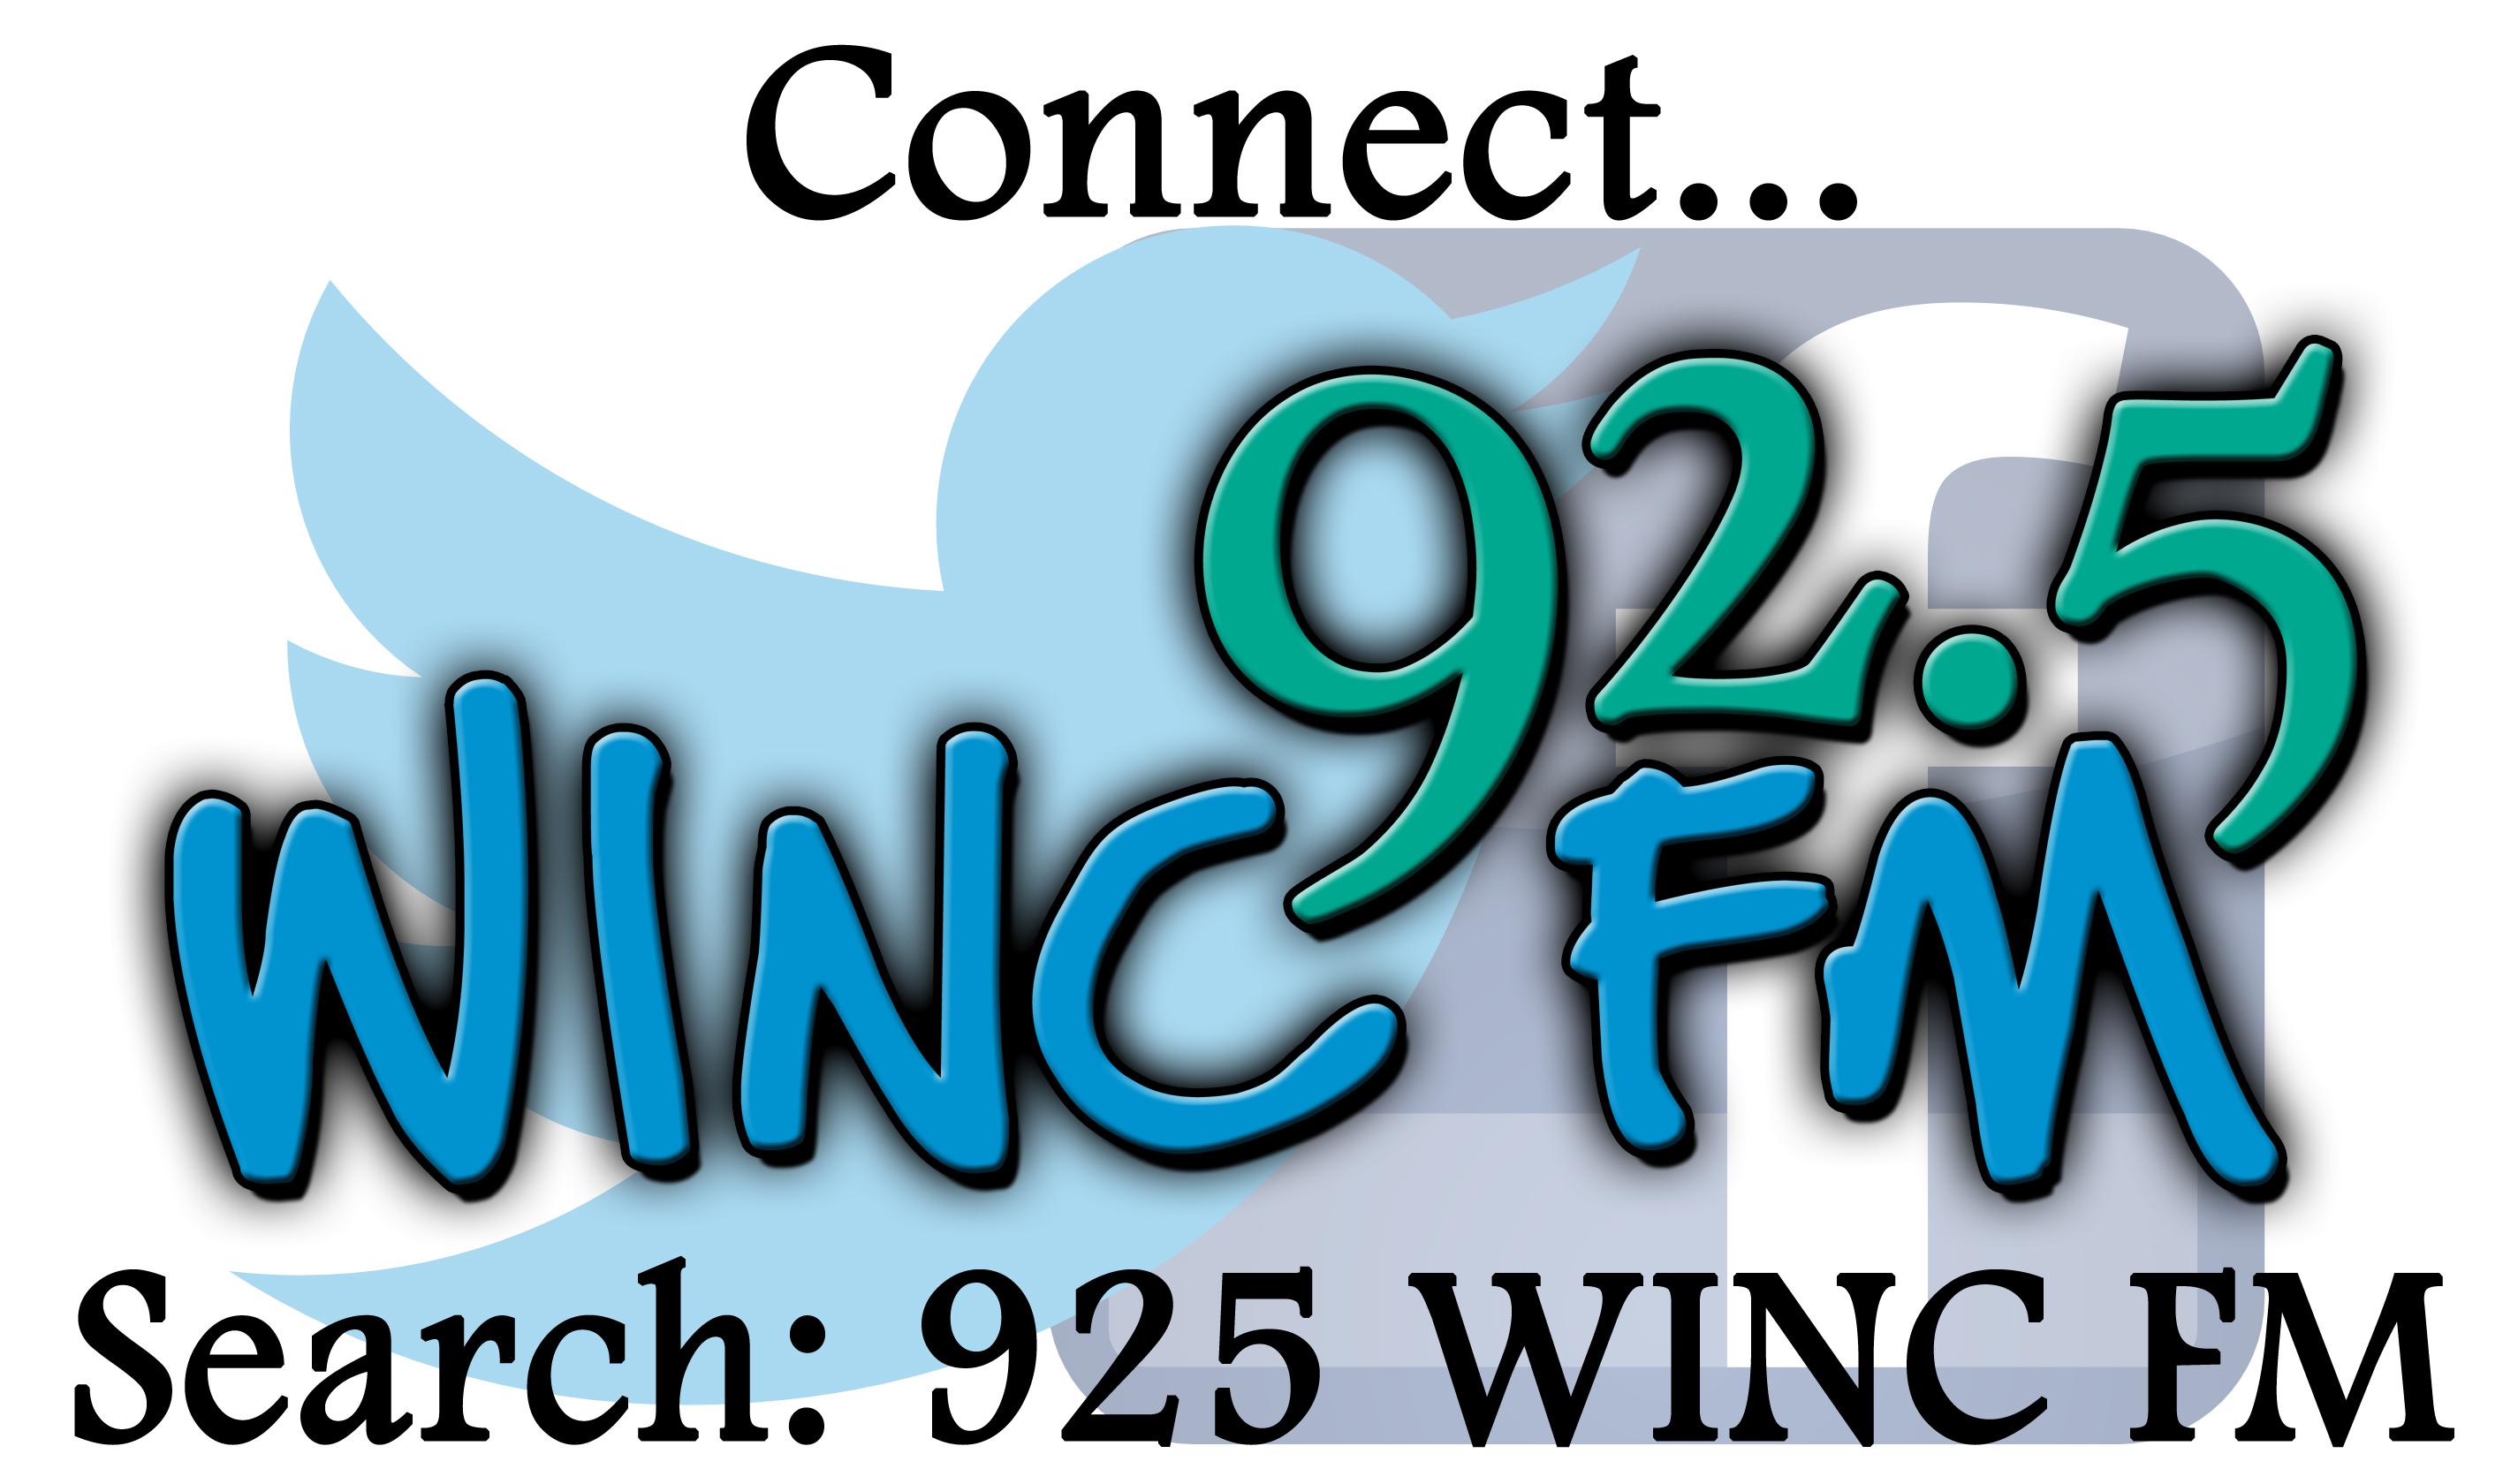 WINCFM-SocialImage-081514